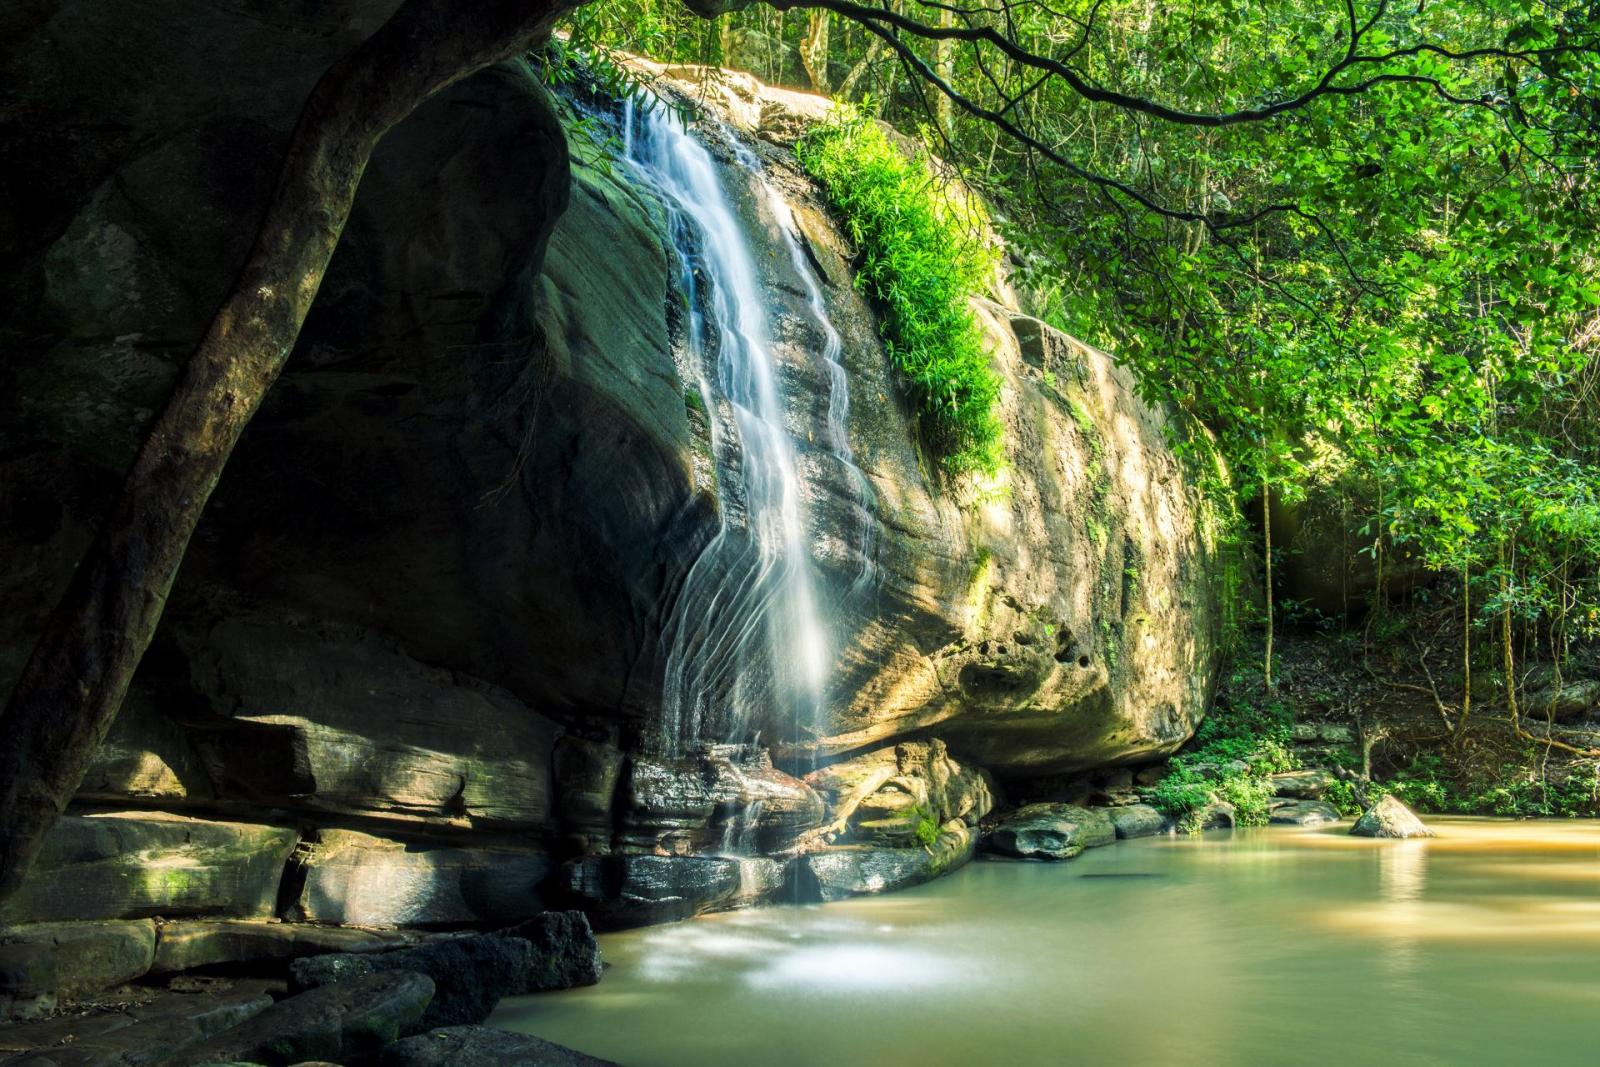 Serenity Falls Wasserfall Sunshine Coast Queensland Australien Regenwald